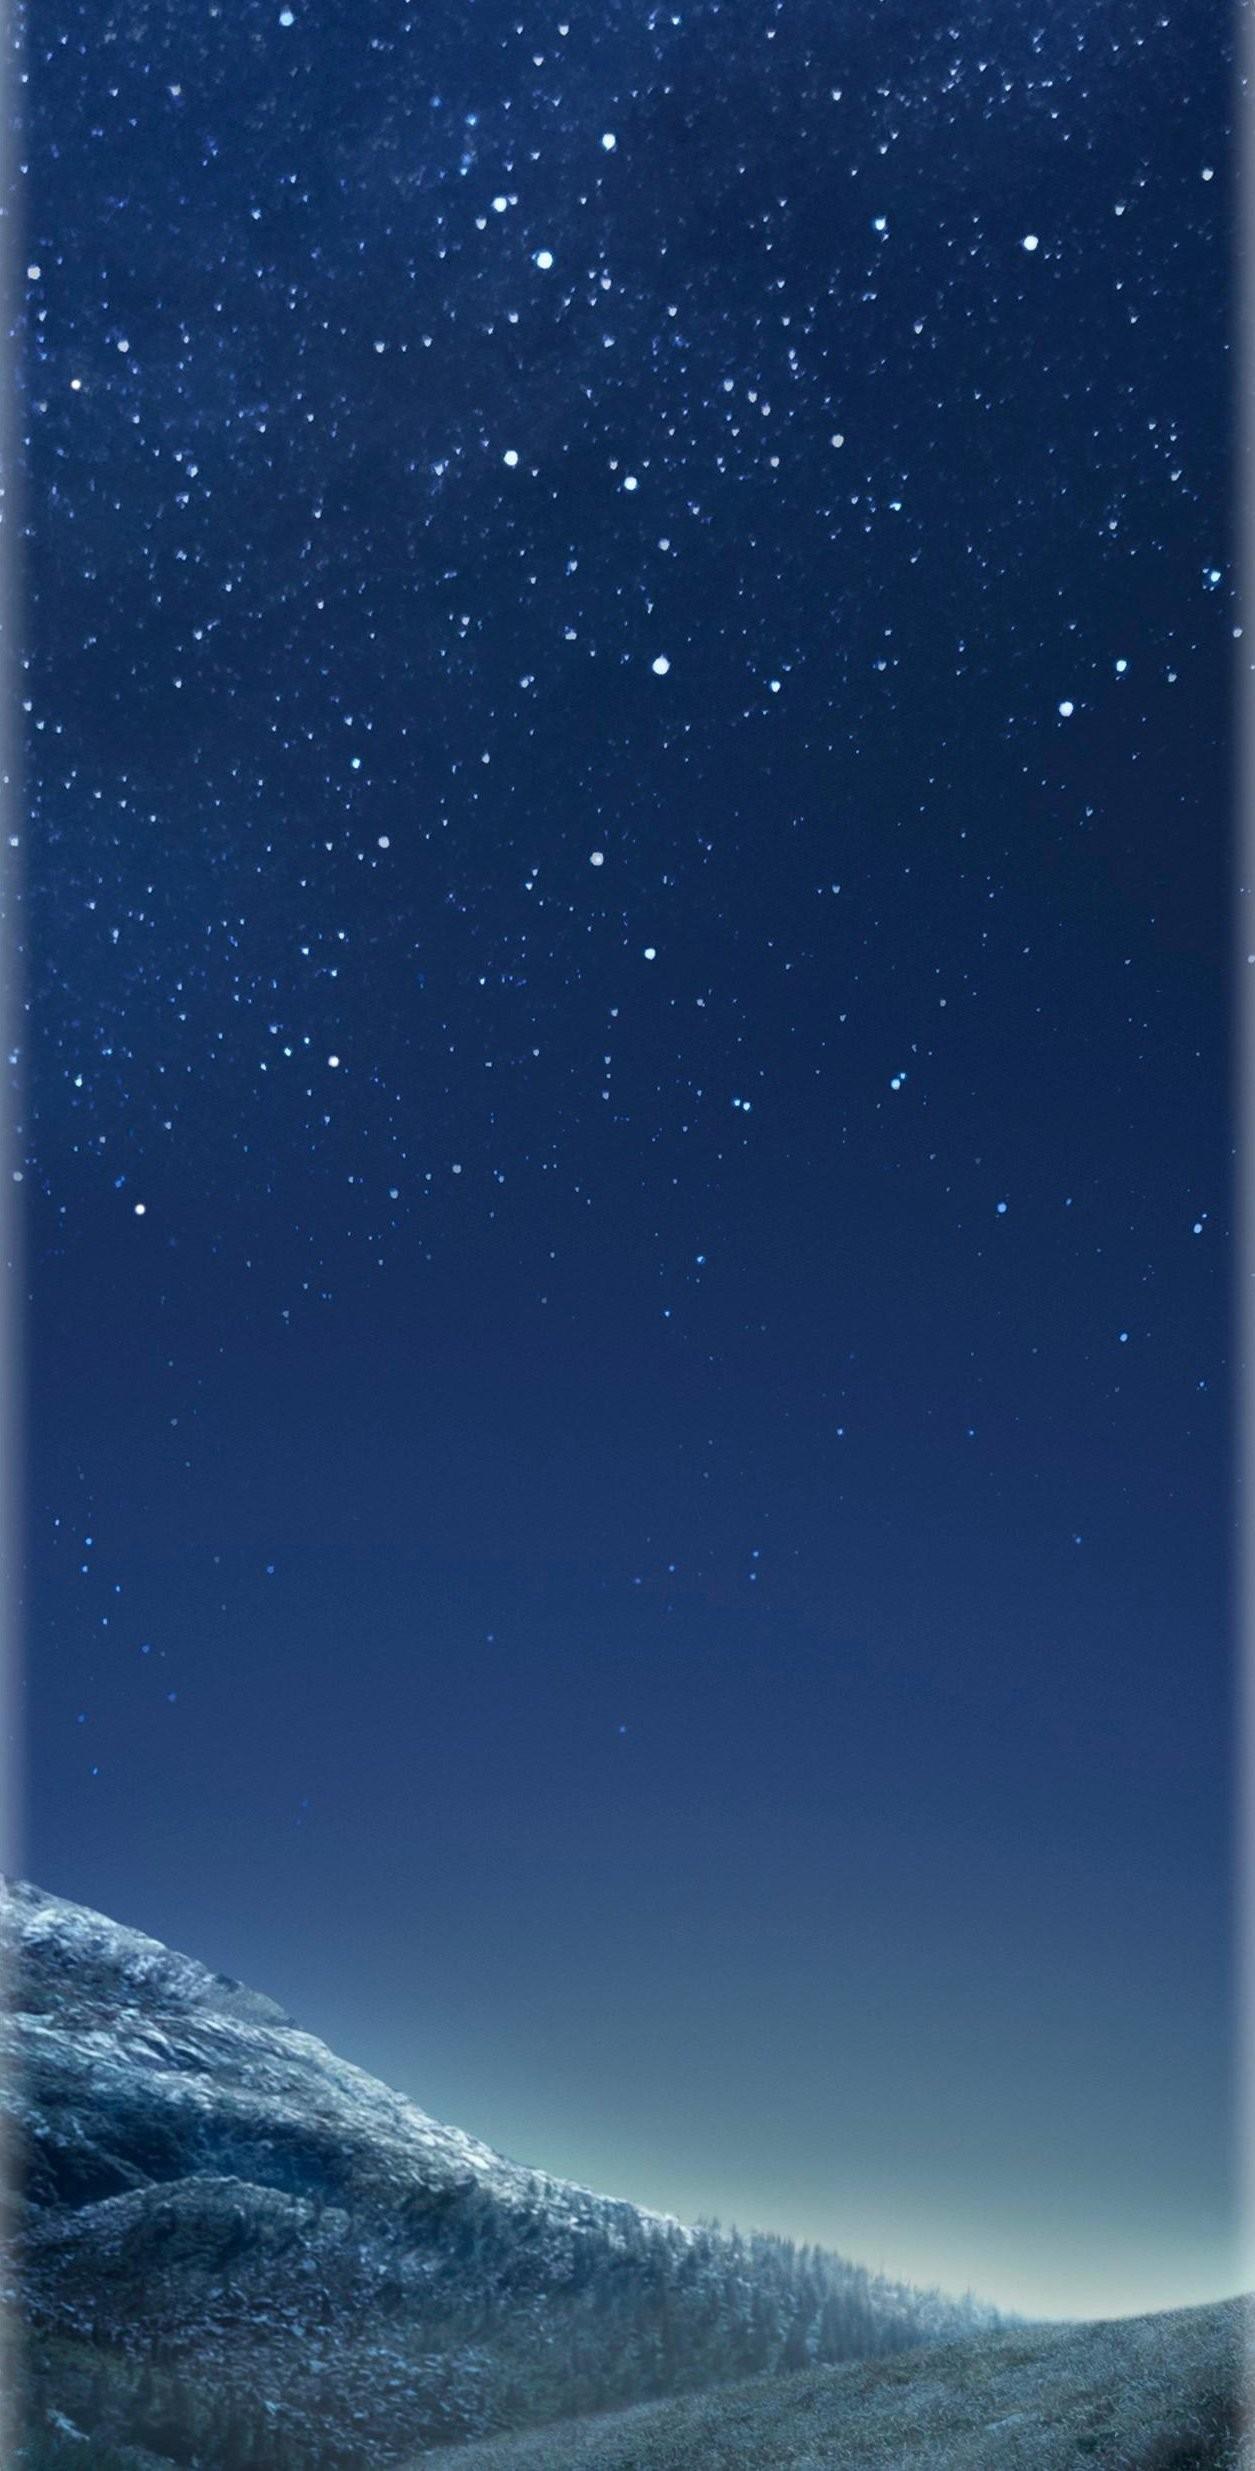 Samsung Galaxy Wallpaper 85 Images